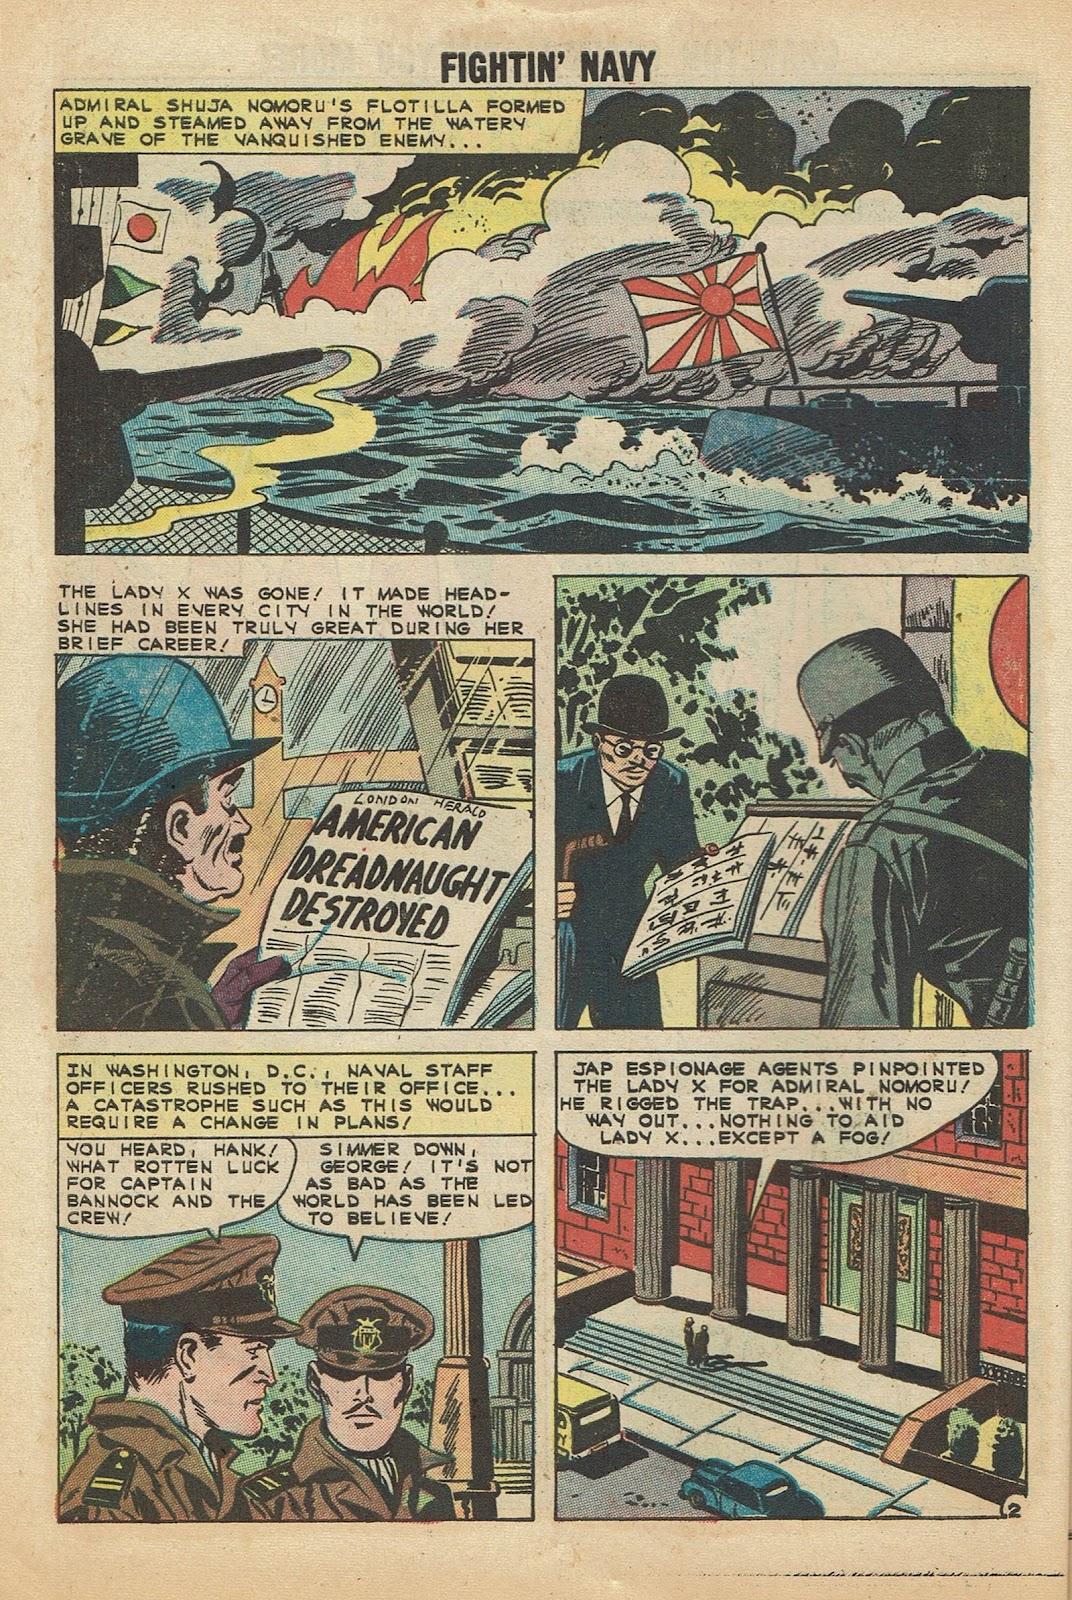 Read online Fightin' Navy comic -  Issue #97 - 10